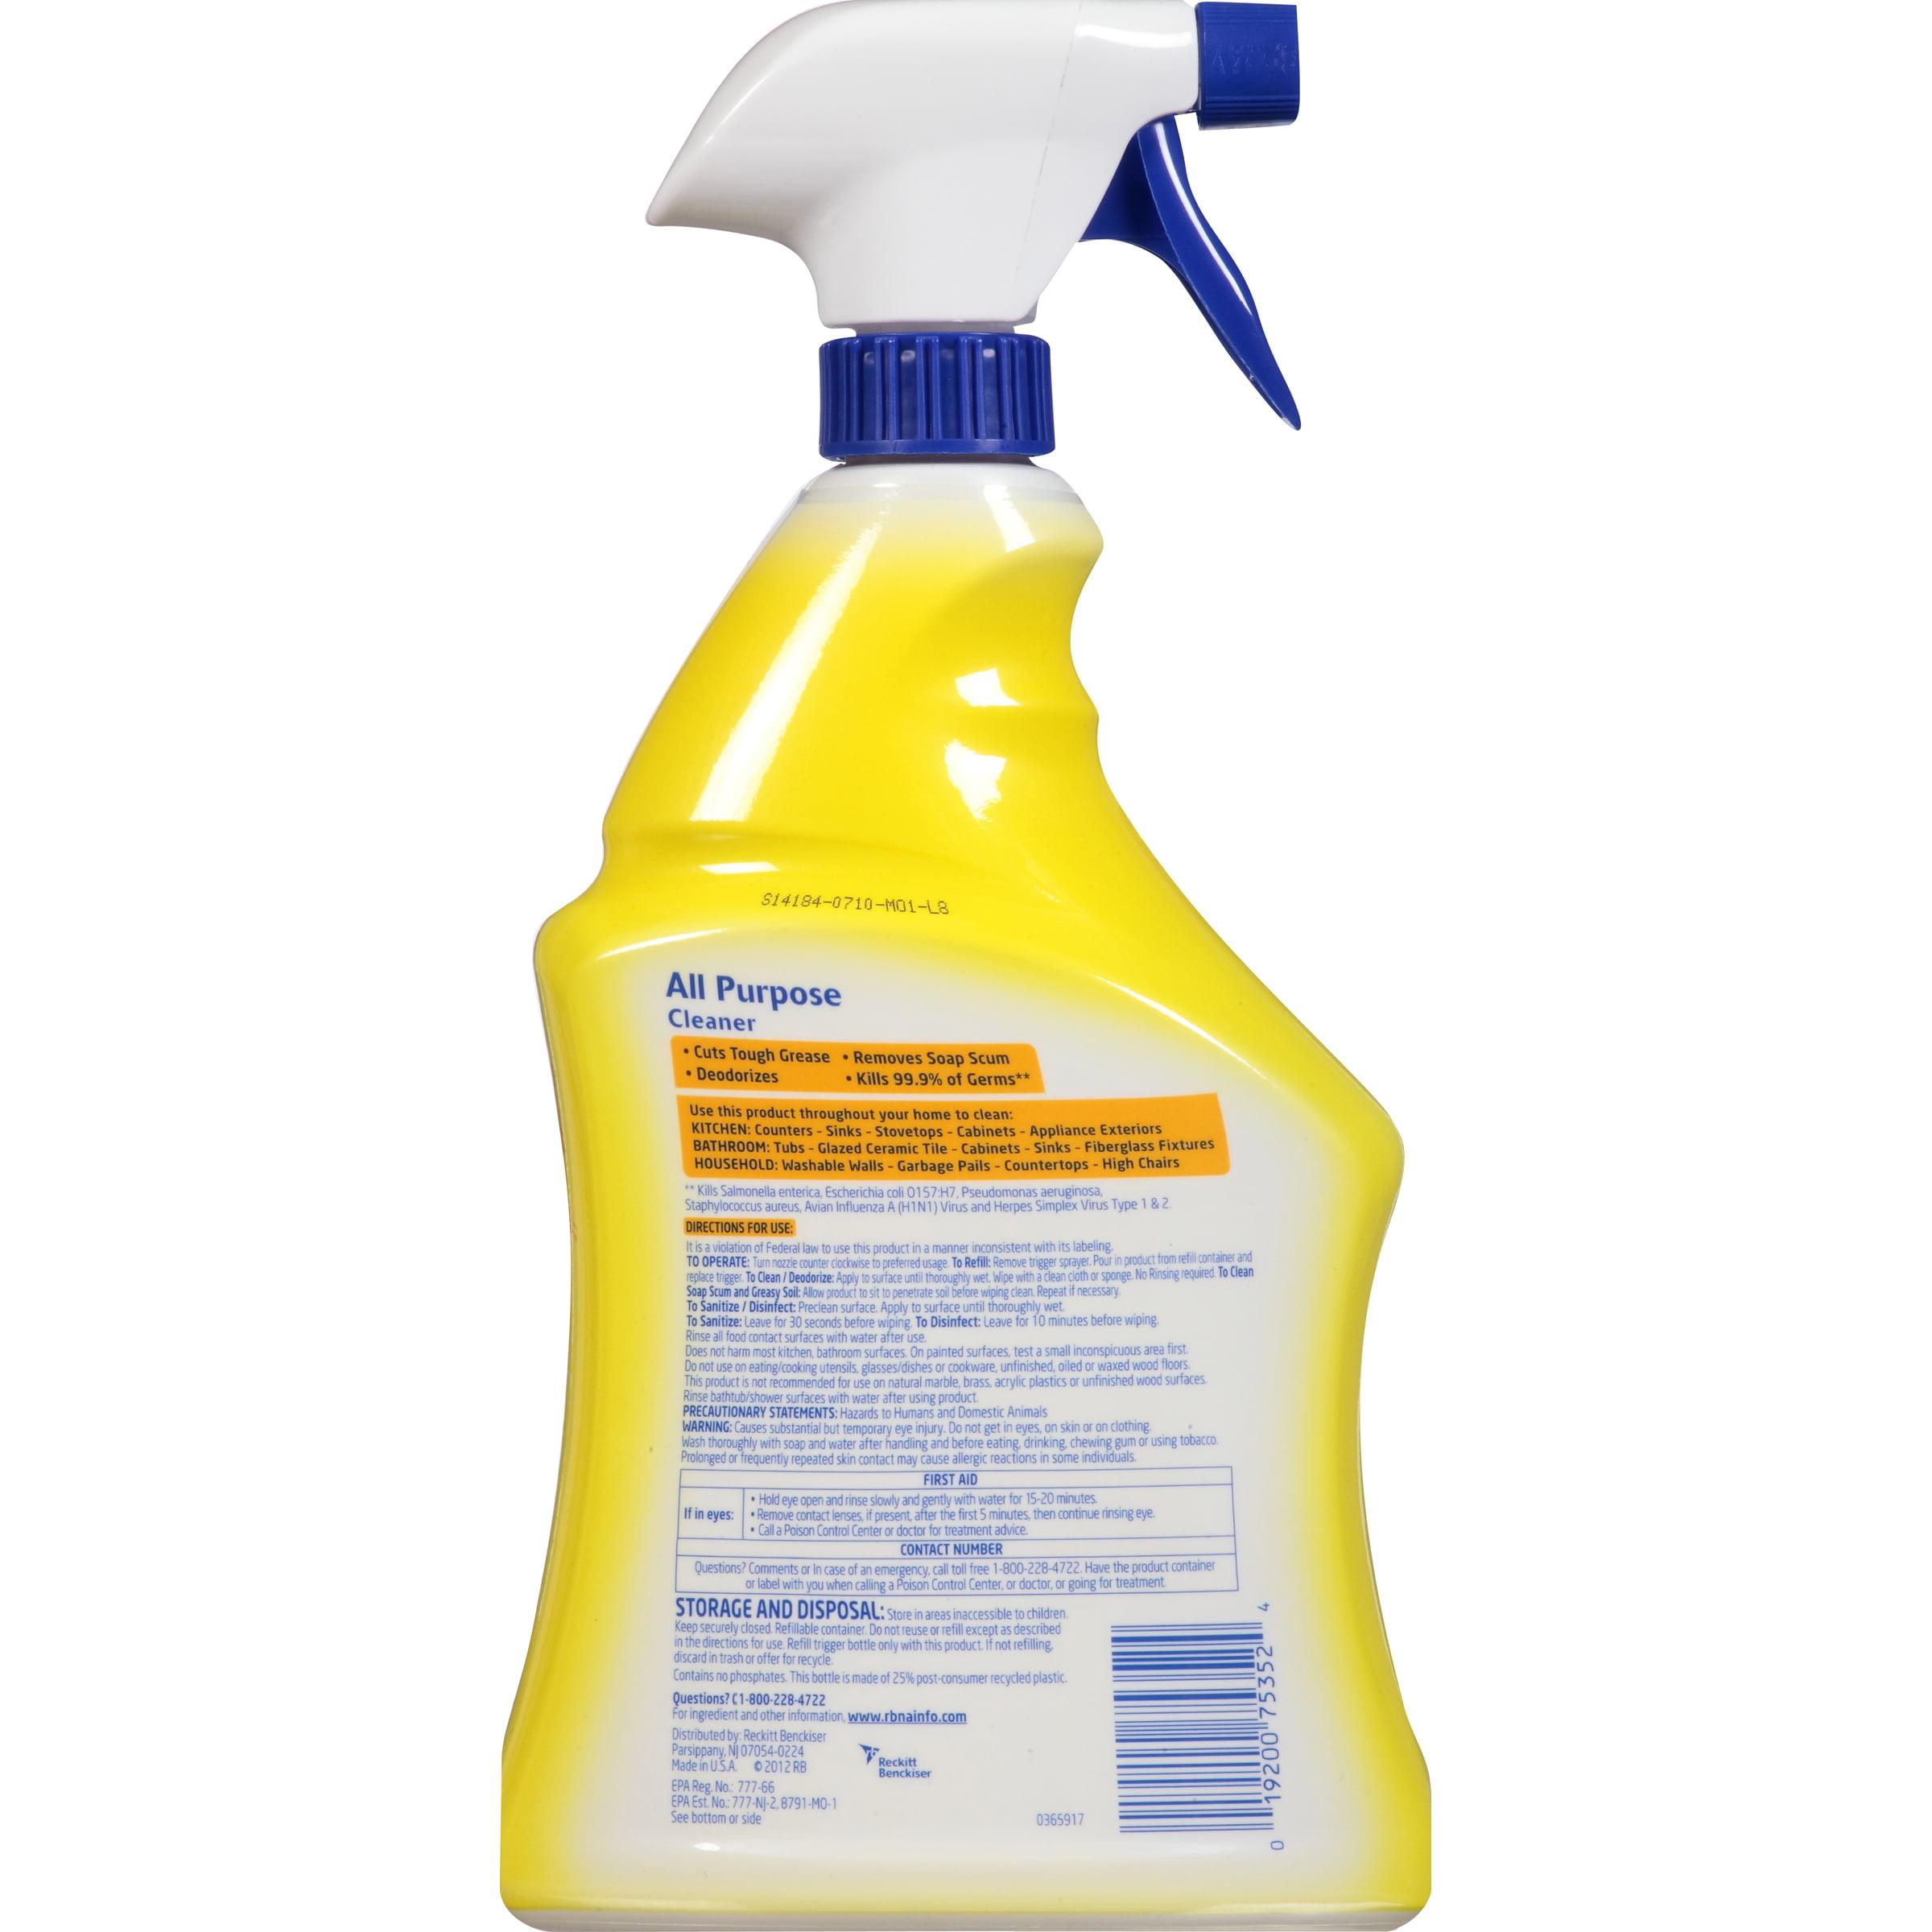 All purpose bathroom cleaner - Lysol Brand Ii Ready To Use All Purpose Cleaner Lemon Breeze 32oz Spray Bottle Walmart Com